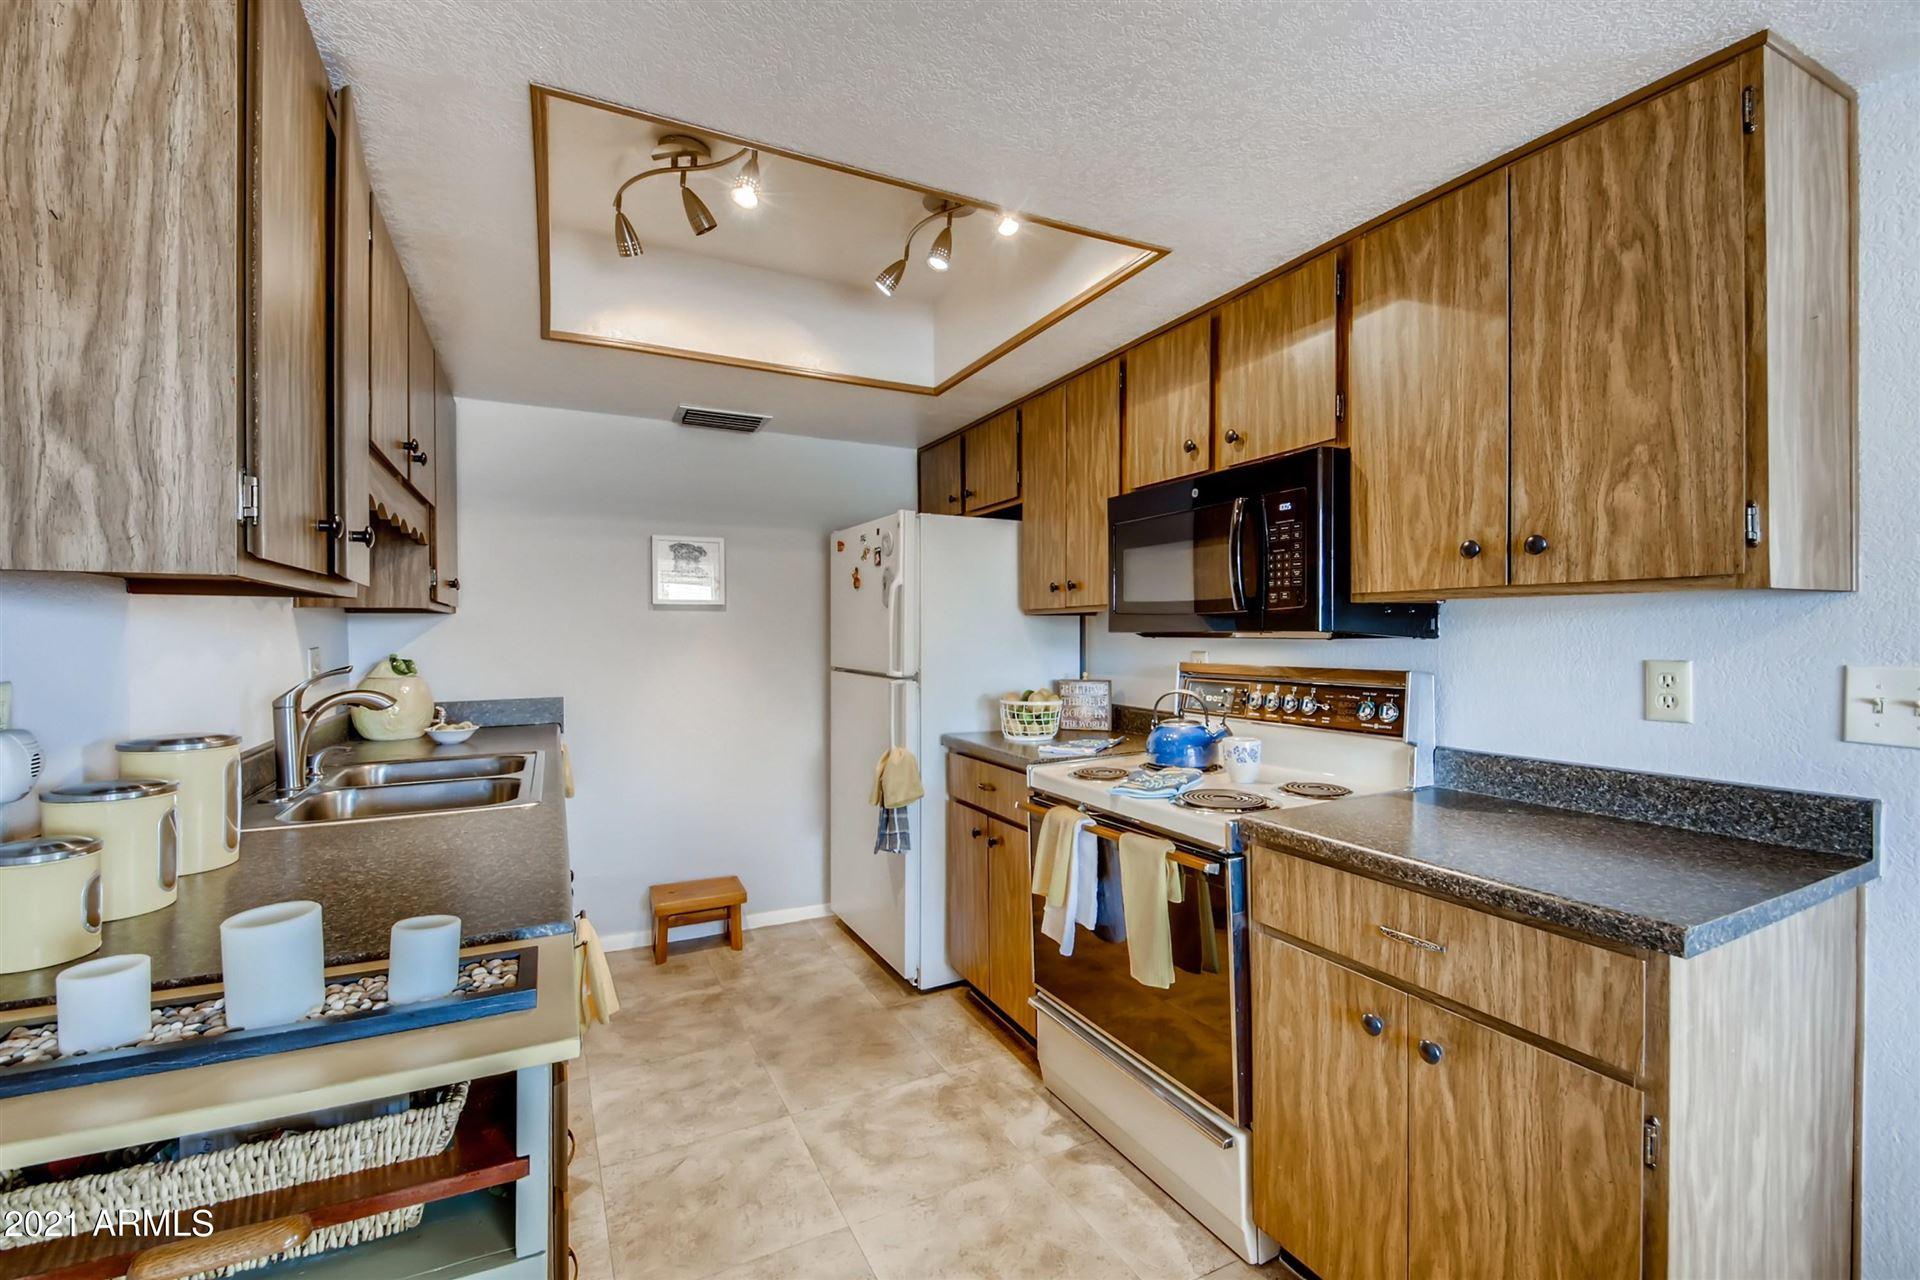 Photo of 9614 W CINNABAR Avenue #B, Peoria, AZ 85345 (MLS # 6267617)